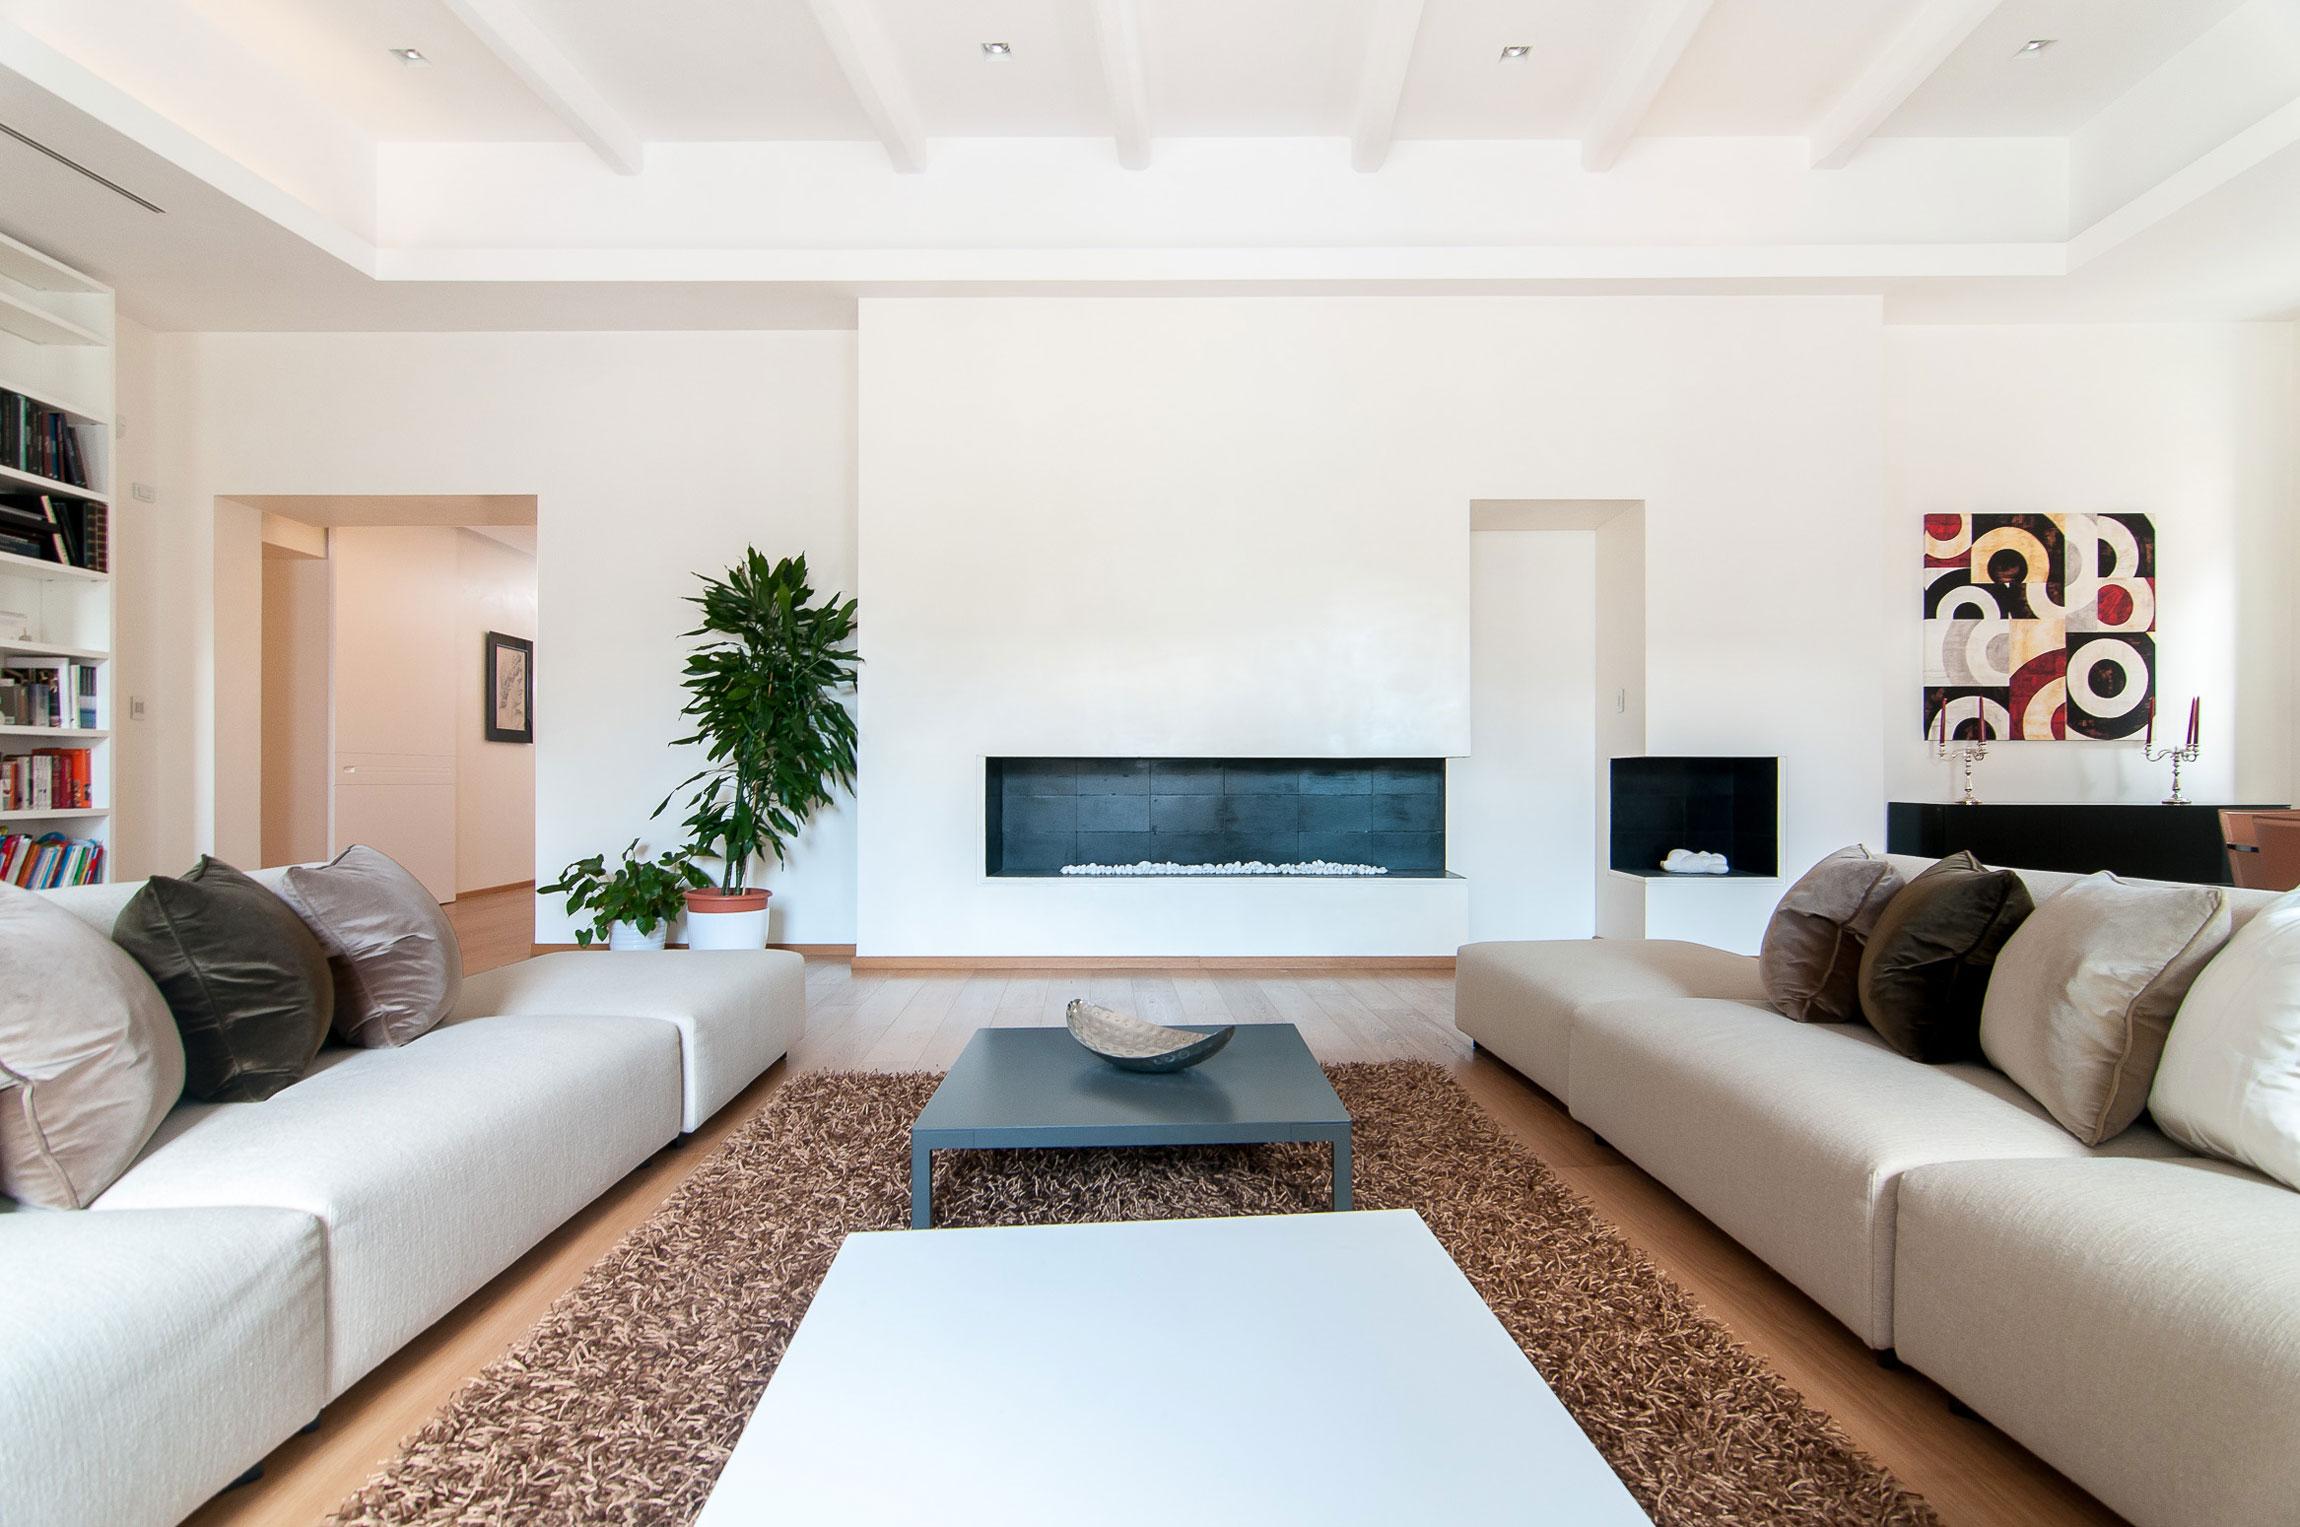 CM Apartment in Rome by 3C+t Capolei Cavalli a.a.-08